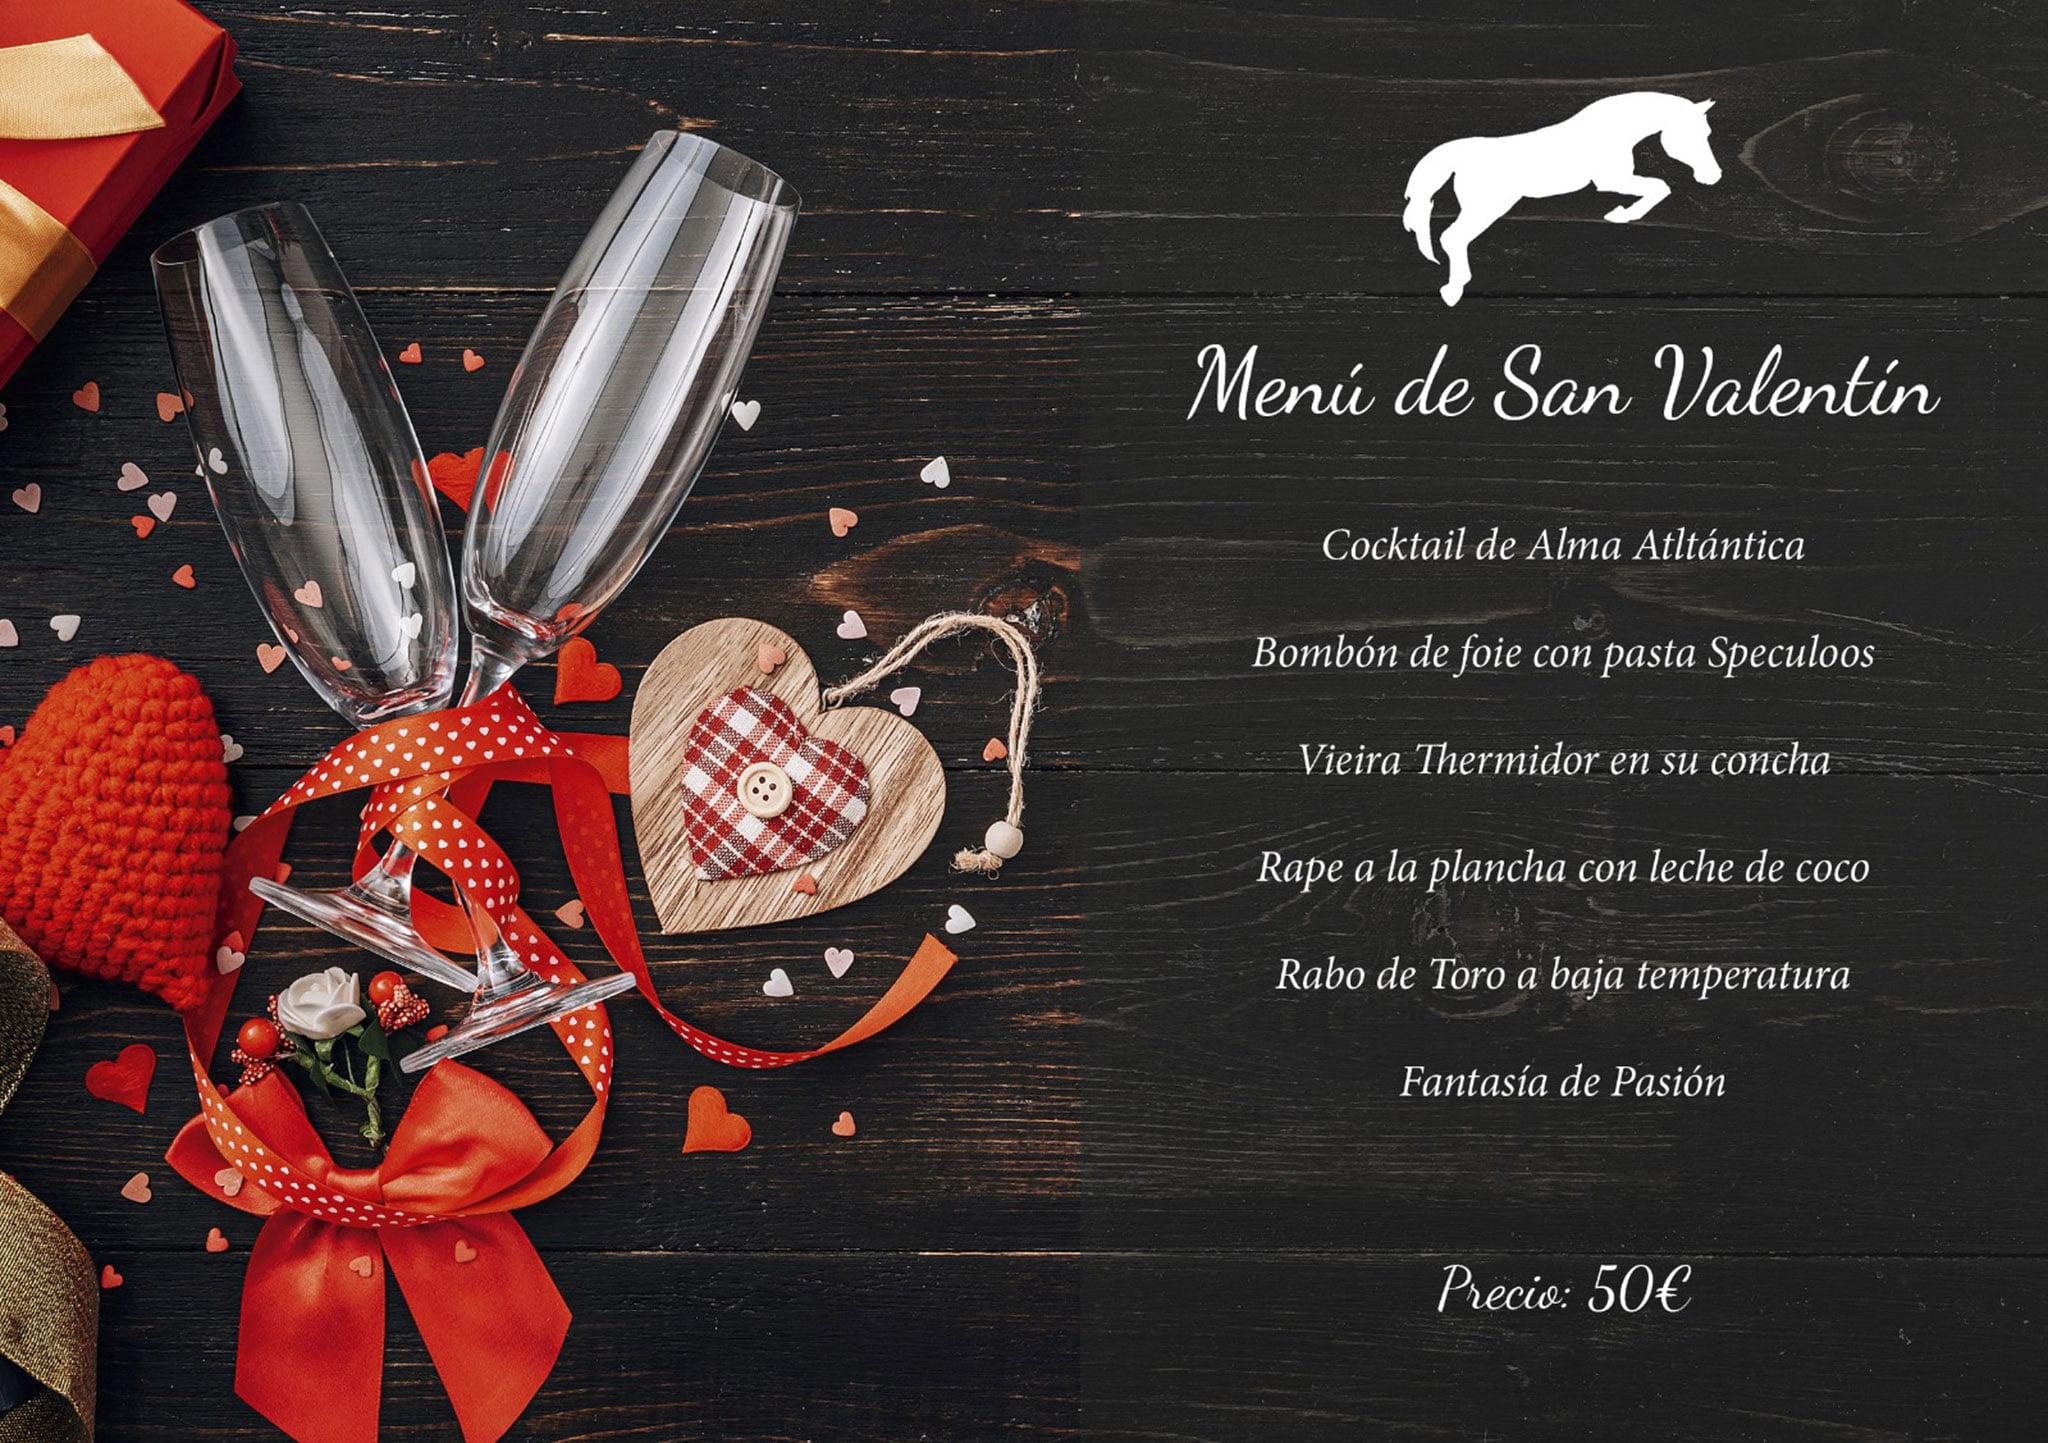 Menú de San Valentín en Restaurante Vall de Cavall